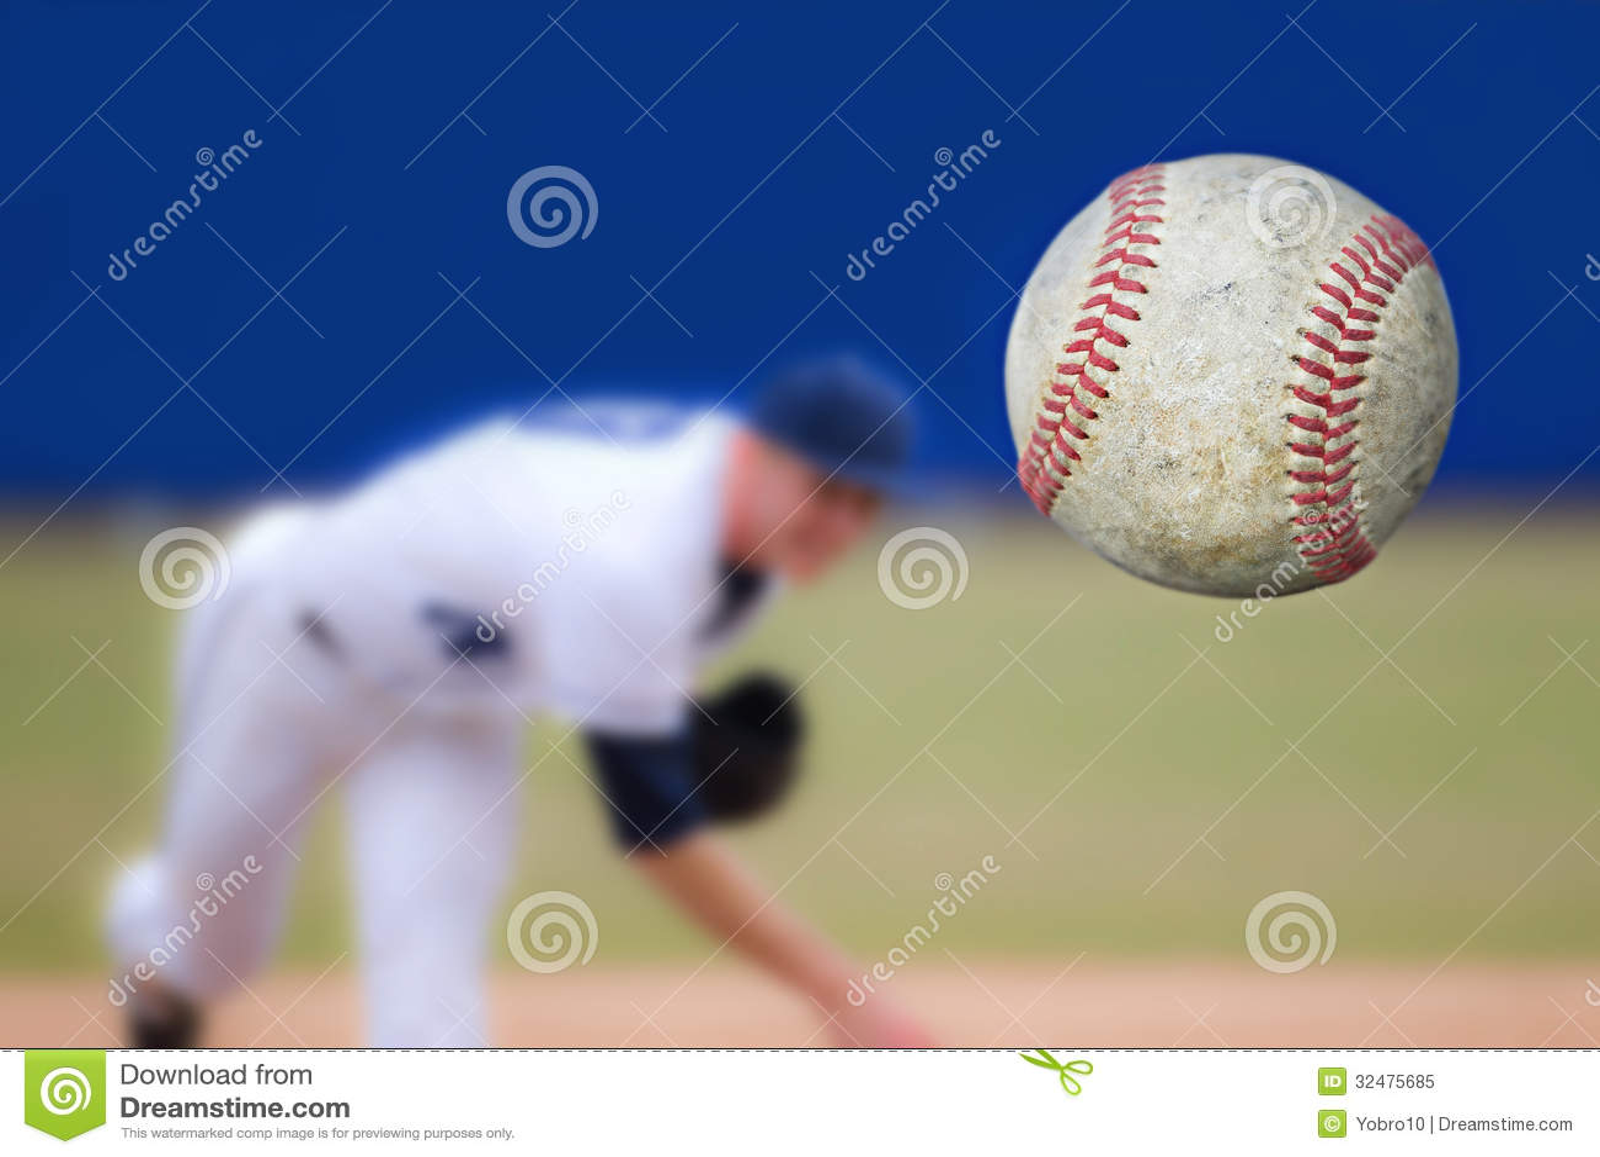 Lanciatore di baseball